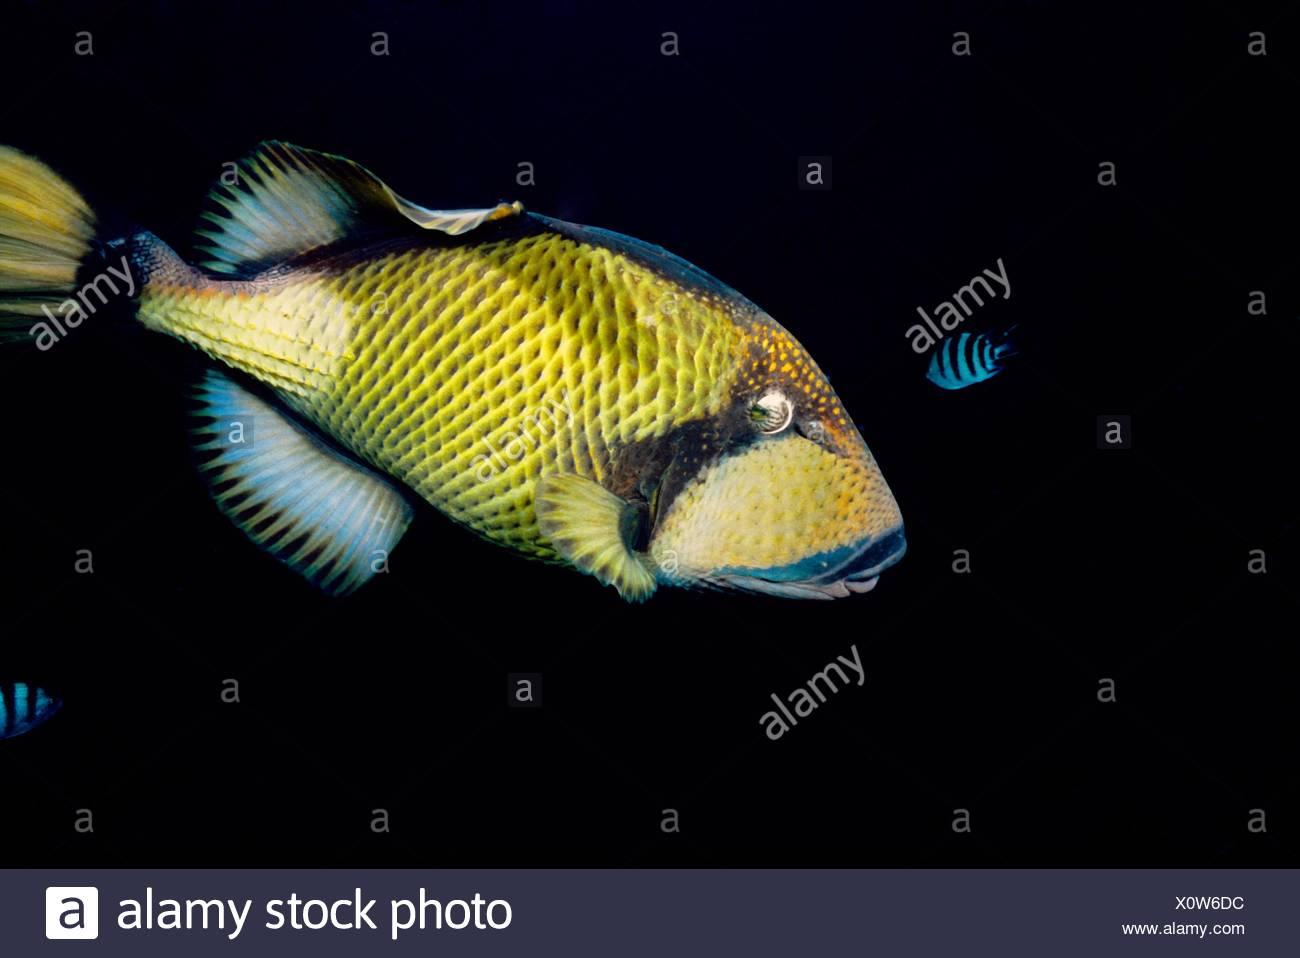 Titan triggerfish Balistoides viridescens  Mauritius Island  Republic of Mauritius  Southwestern Indian Ocean - Stock Image